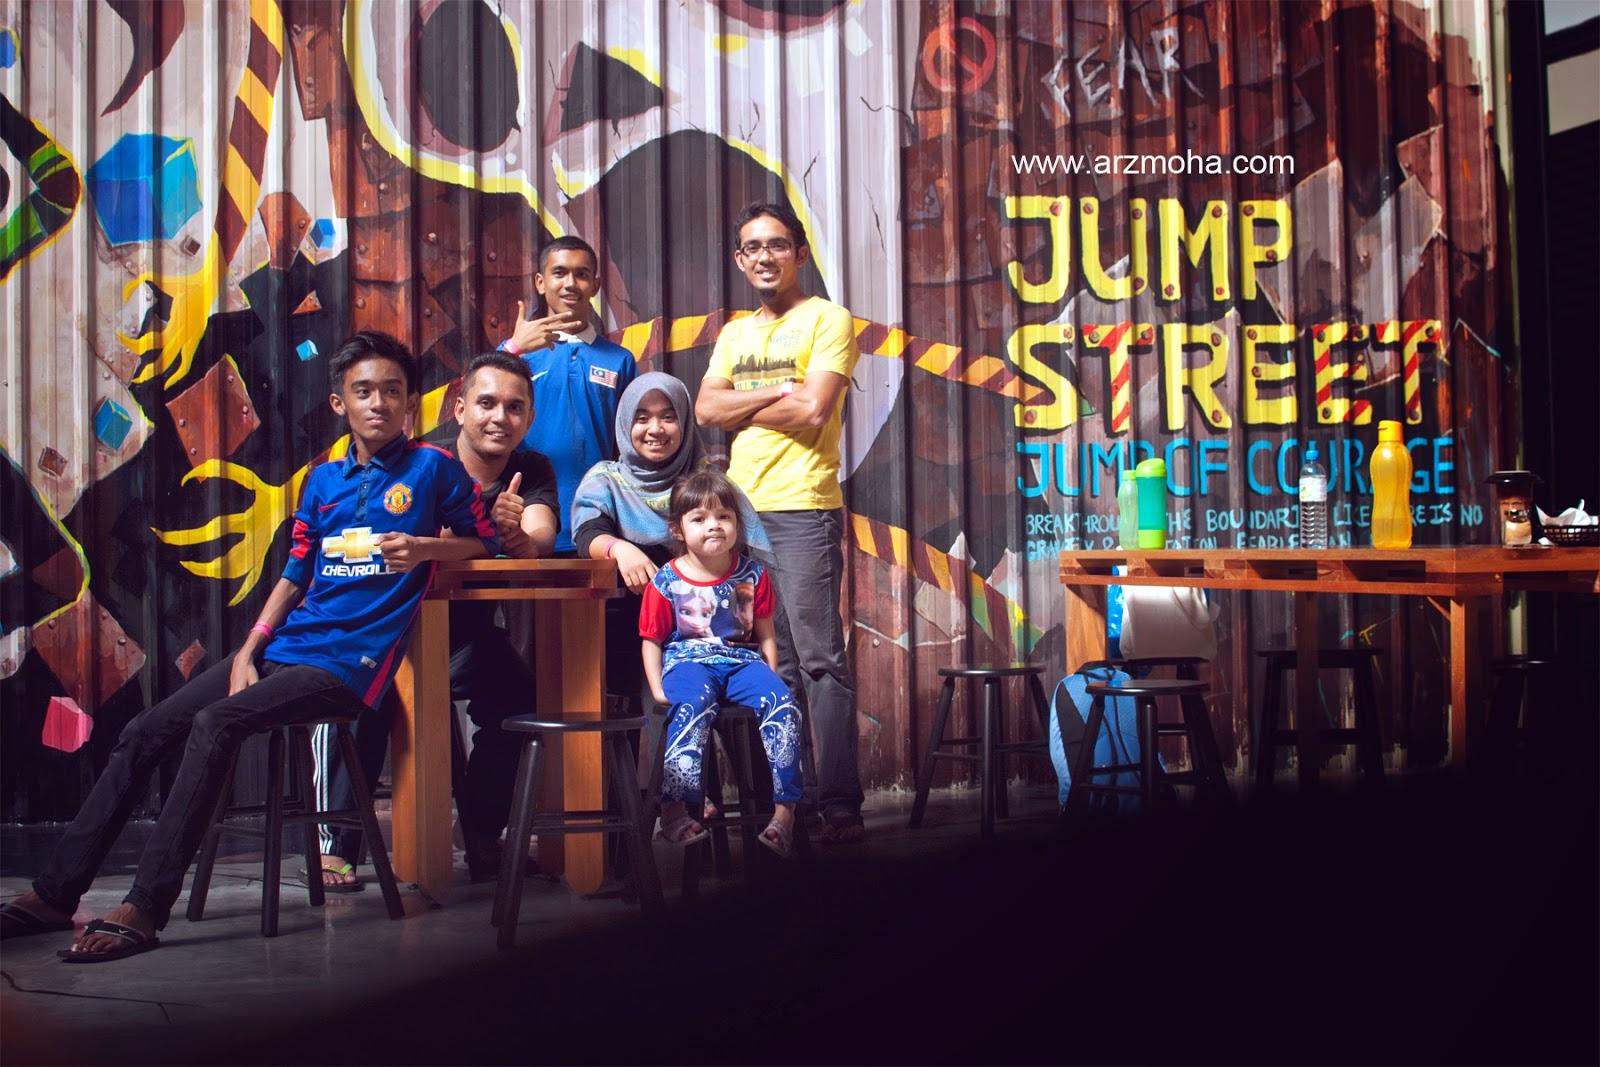 Penang street jump trampoline park, Jump Street, Lompat, gambar cantik, arzmoha, awesome place, penang,